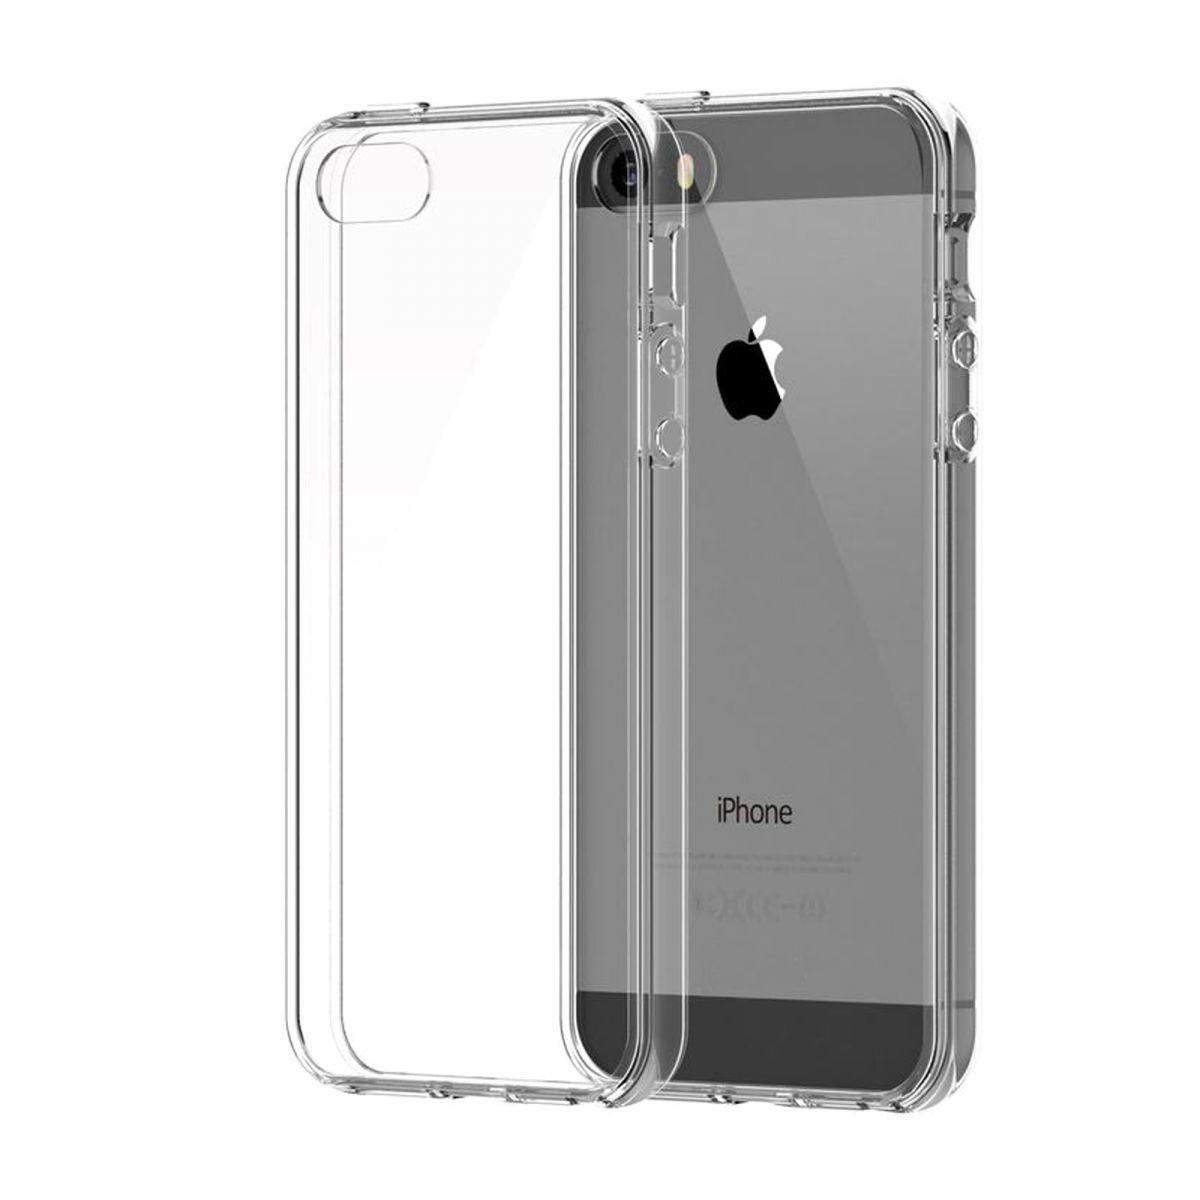 Чехол Крутотенюшка для Apple iPhone 5/5S/SE pipitoo чехол накладка feathers для iphone 5 5s se